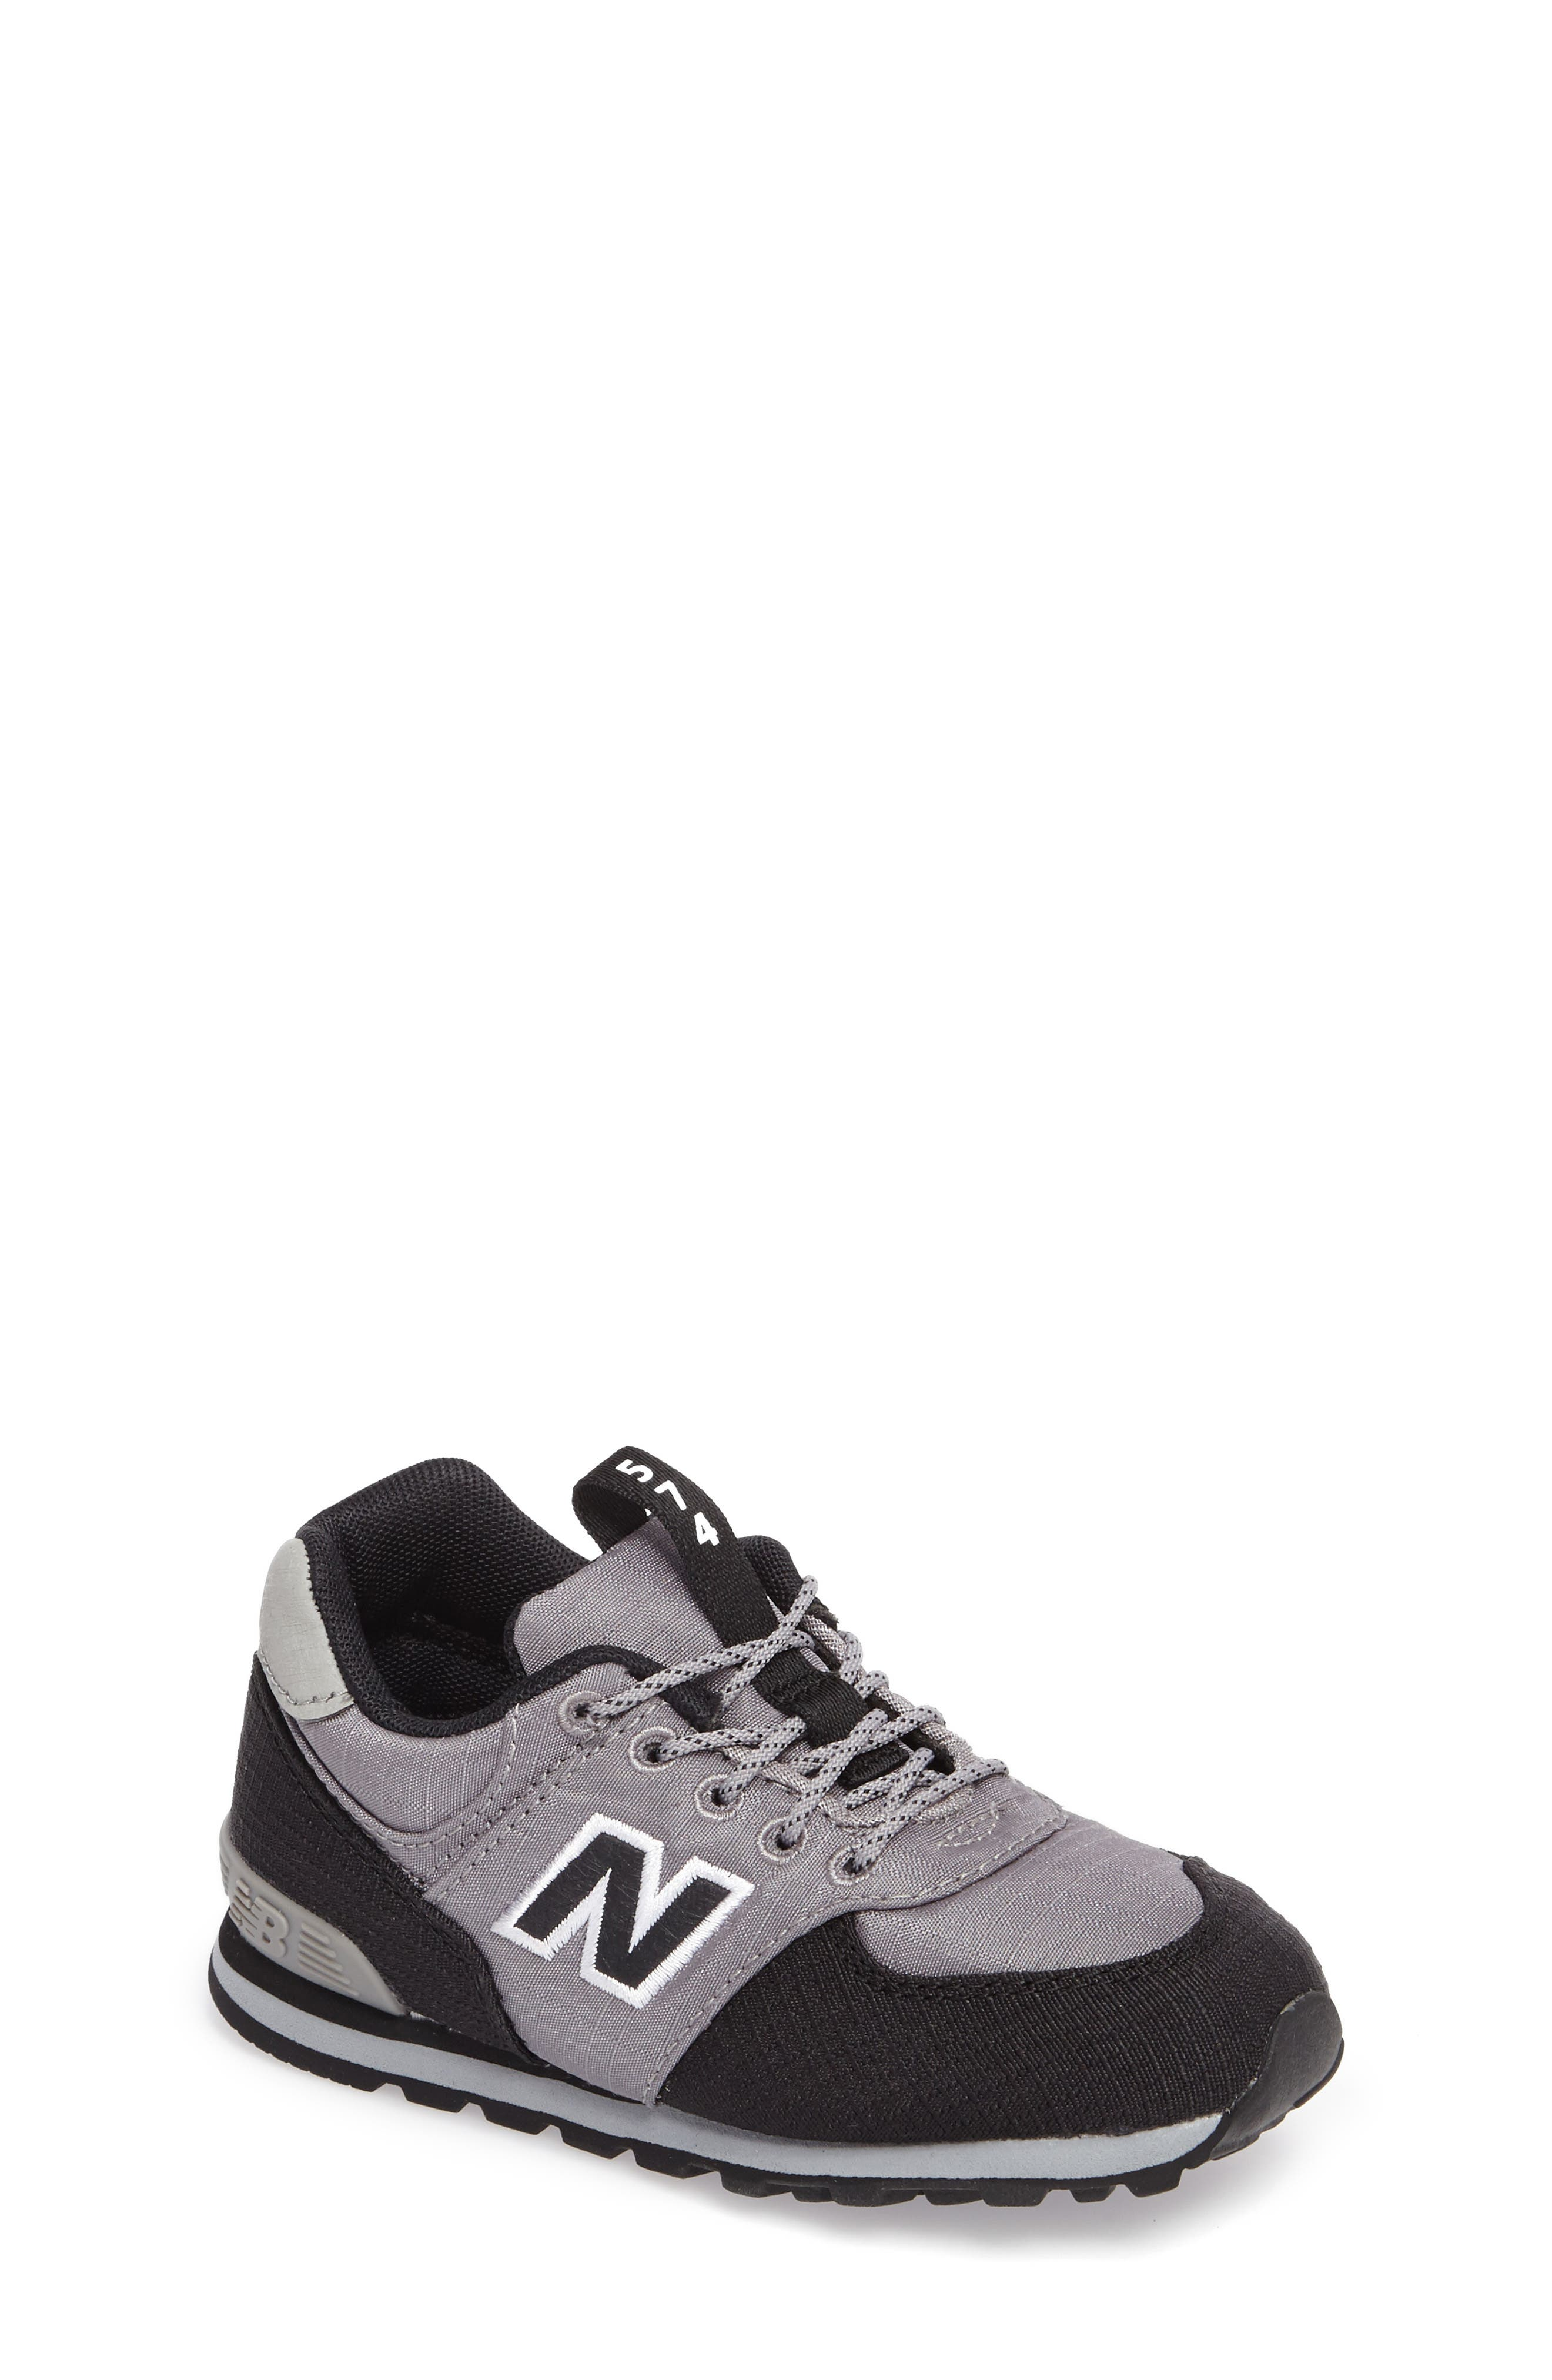 New Balance 990 Sneaker (Baby, Walker \u0026 Toddler)